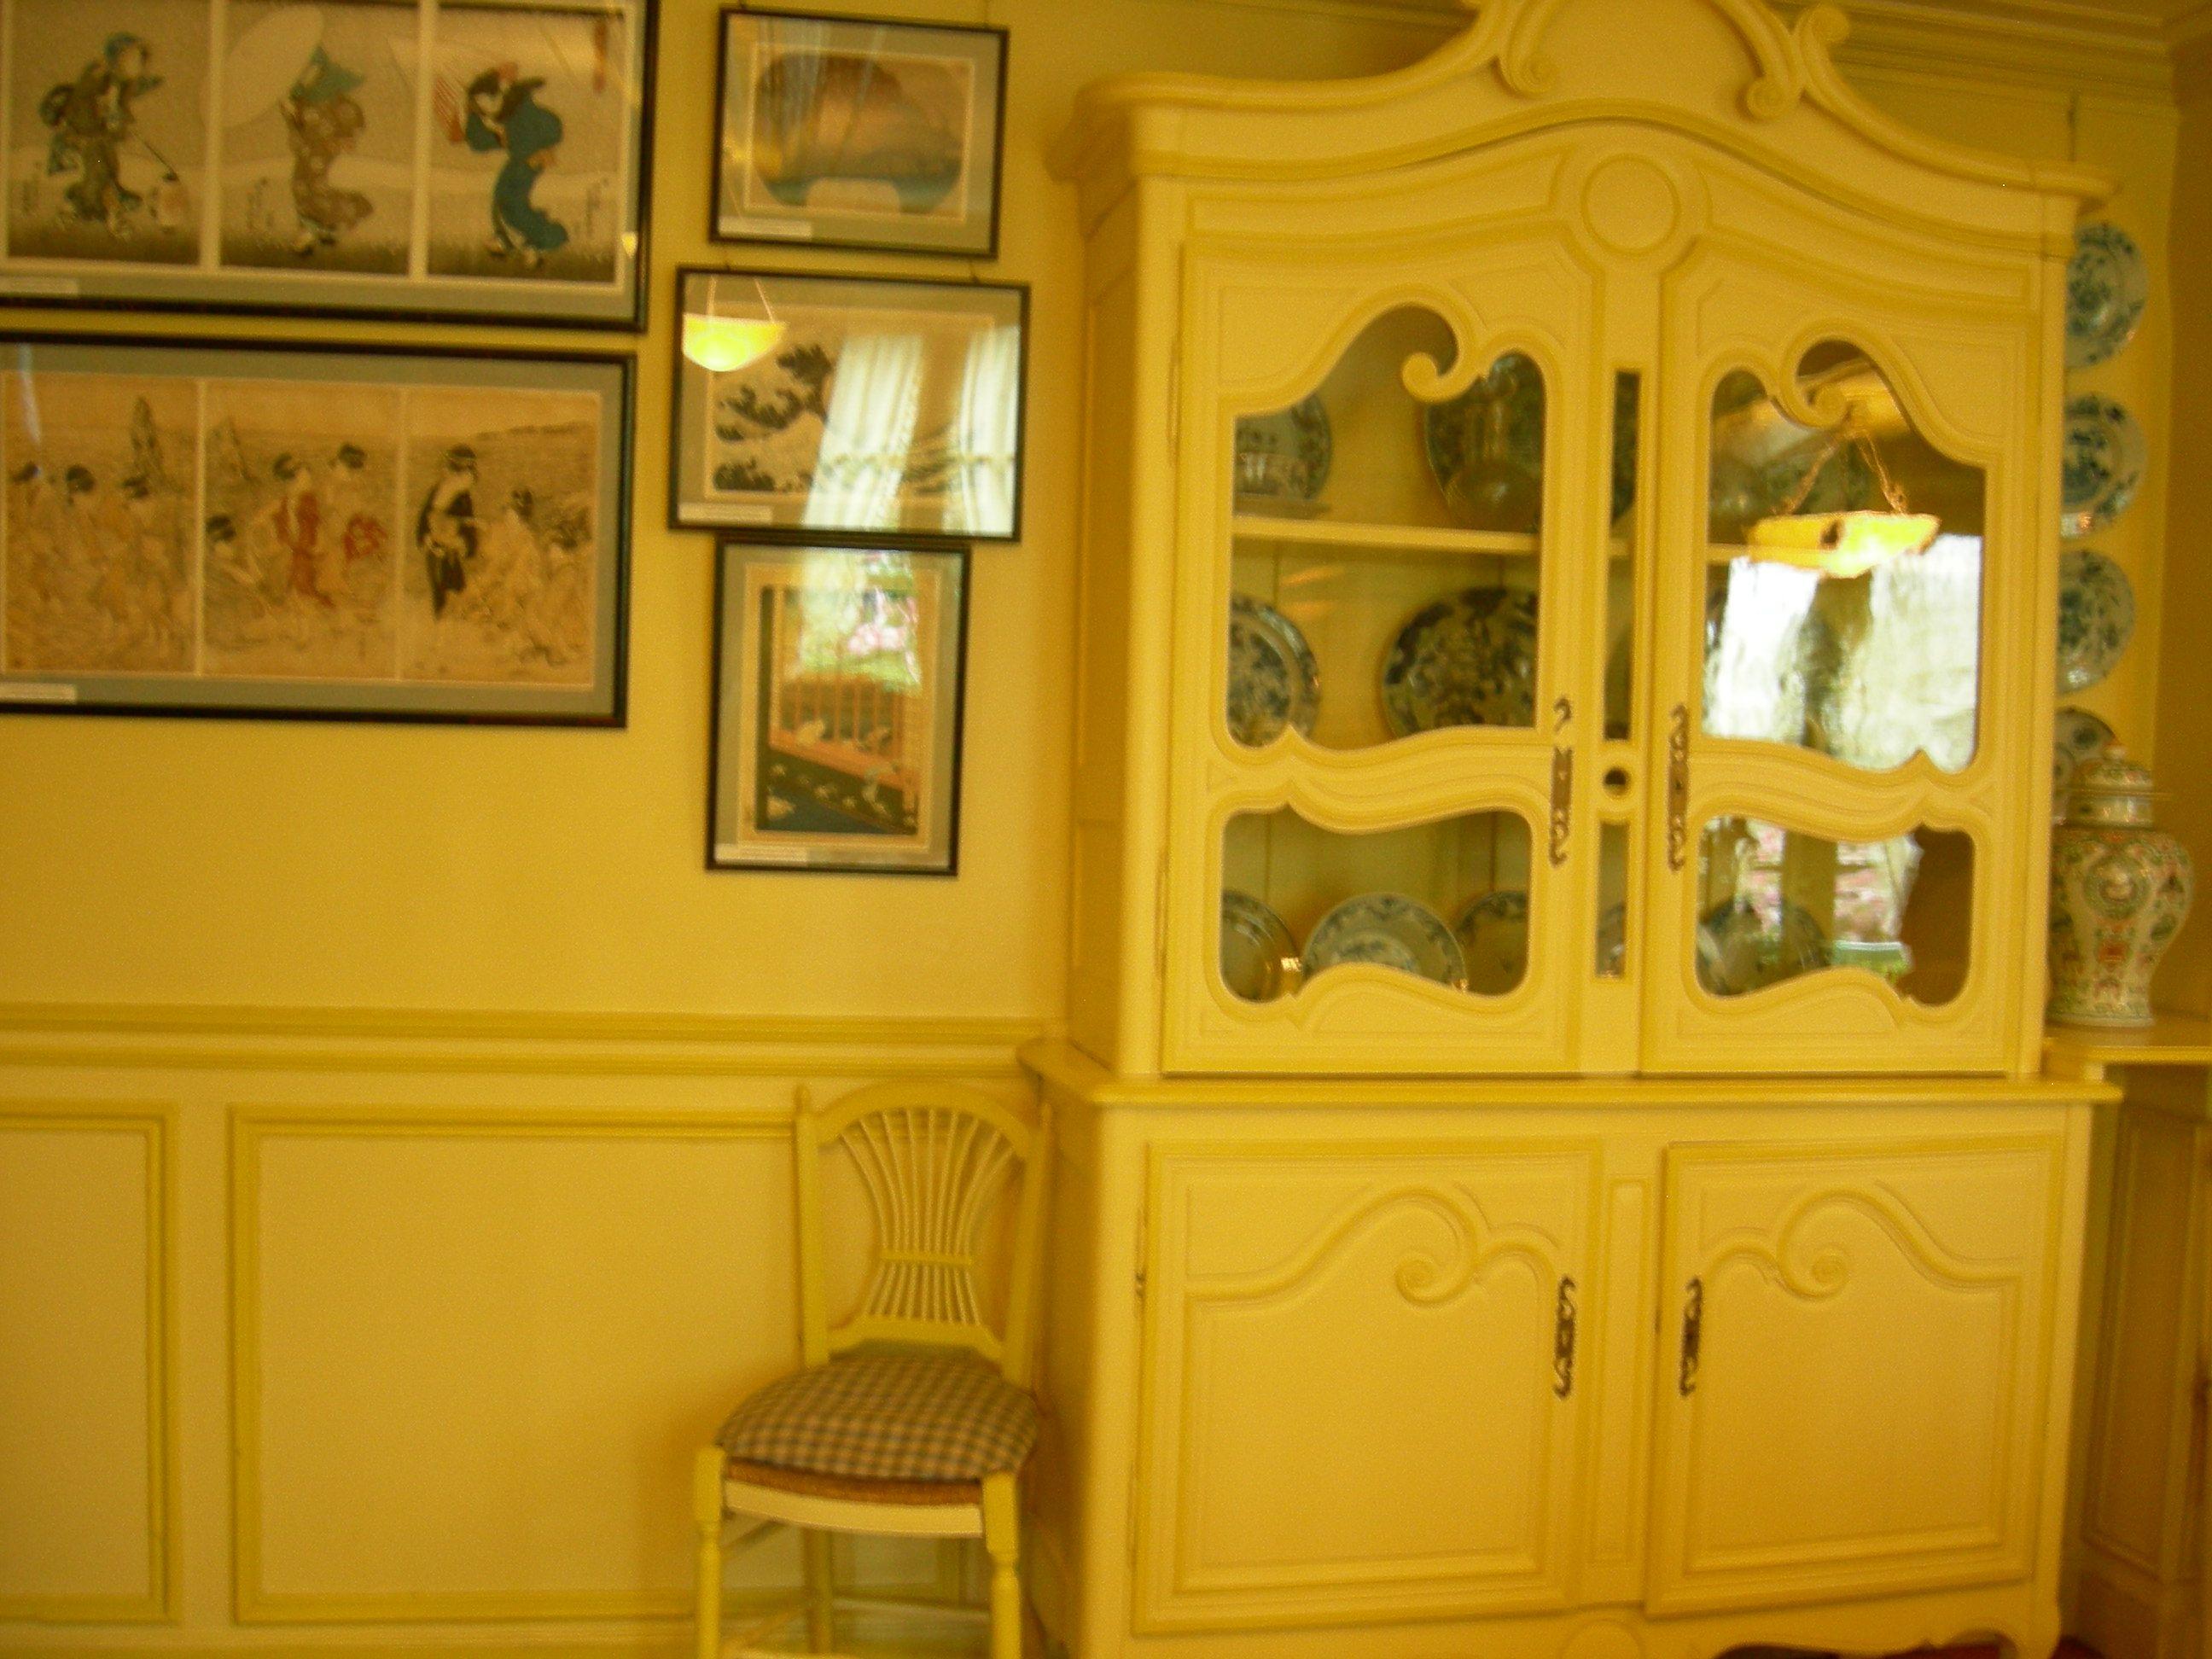 Monet's diningroom